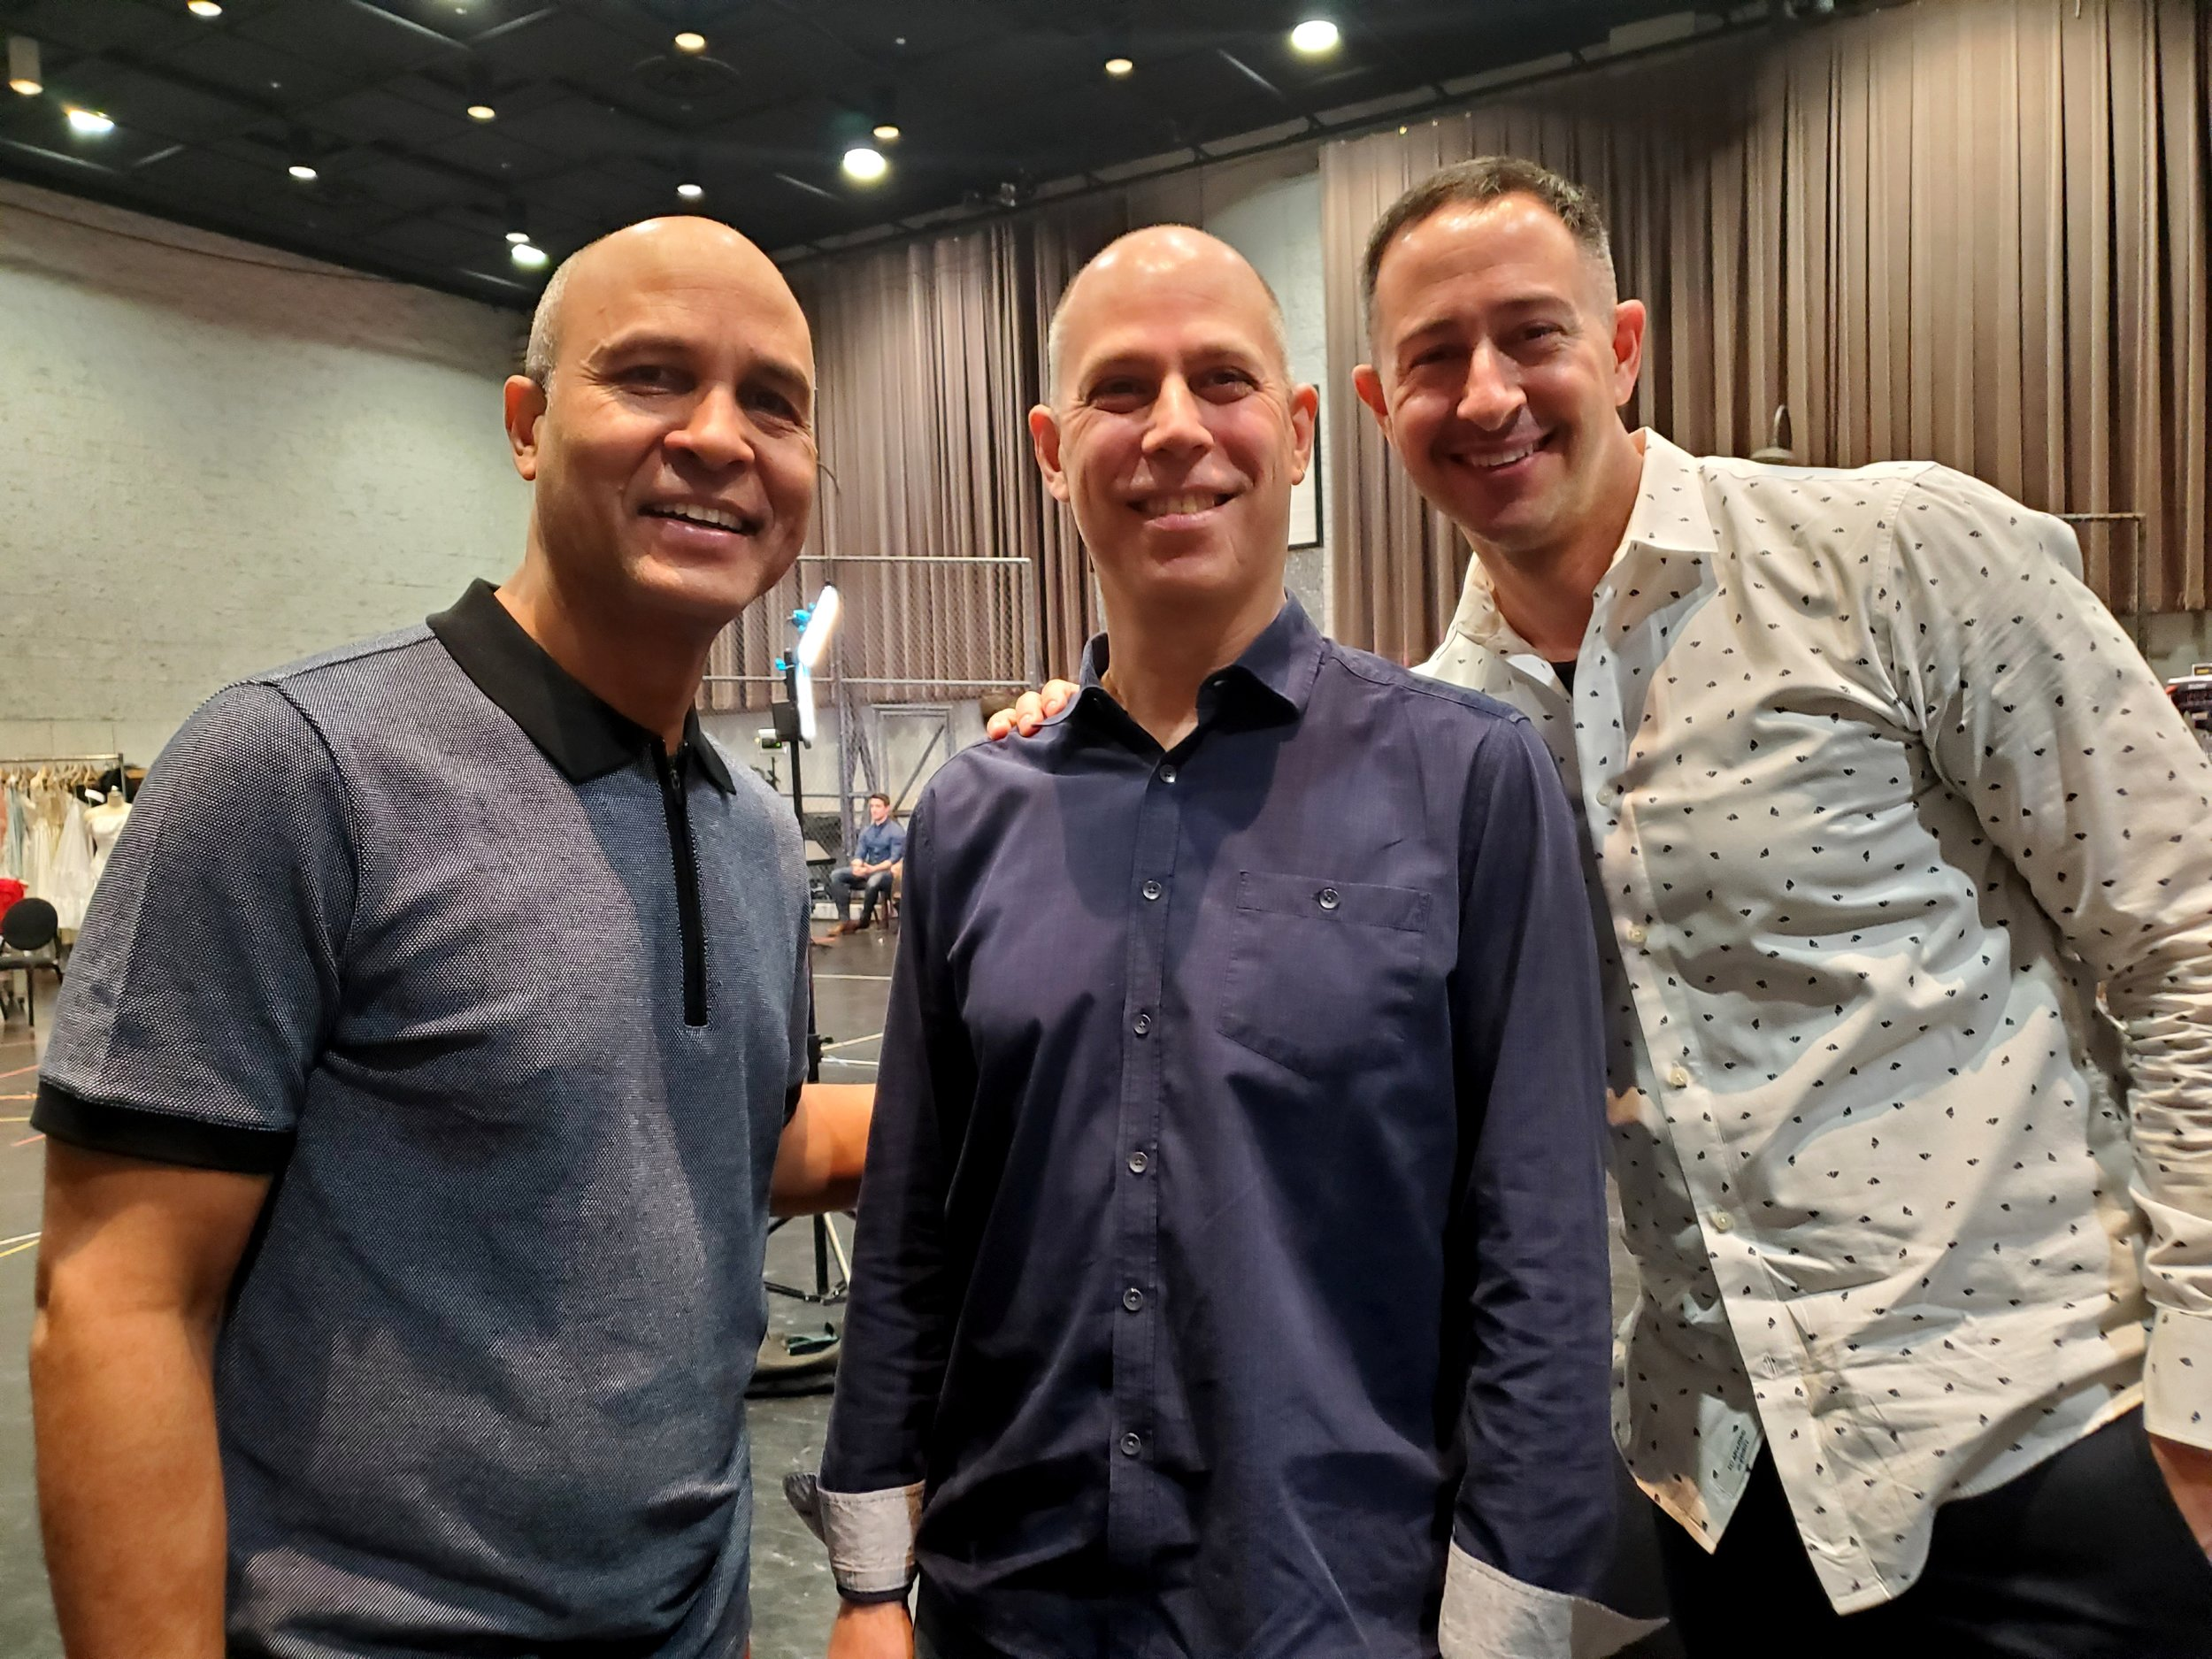 Choreographer Julio Monge, Conductor James Lowe and Associate Director Eric Sean Fogel